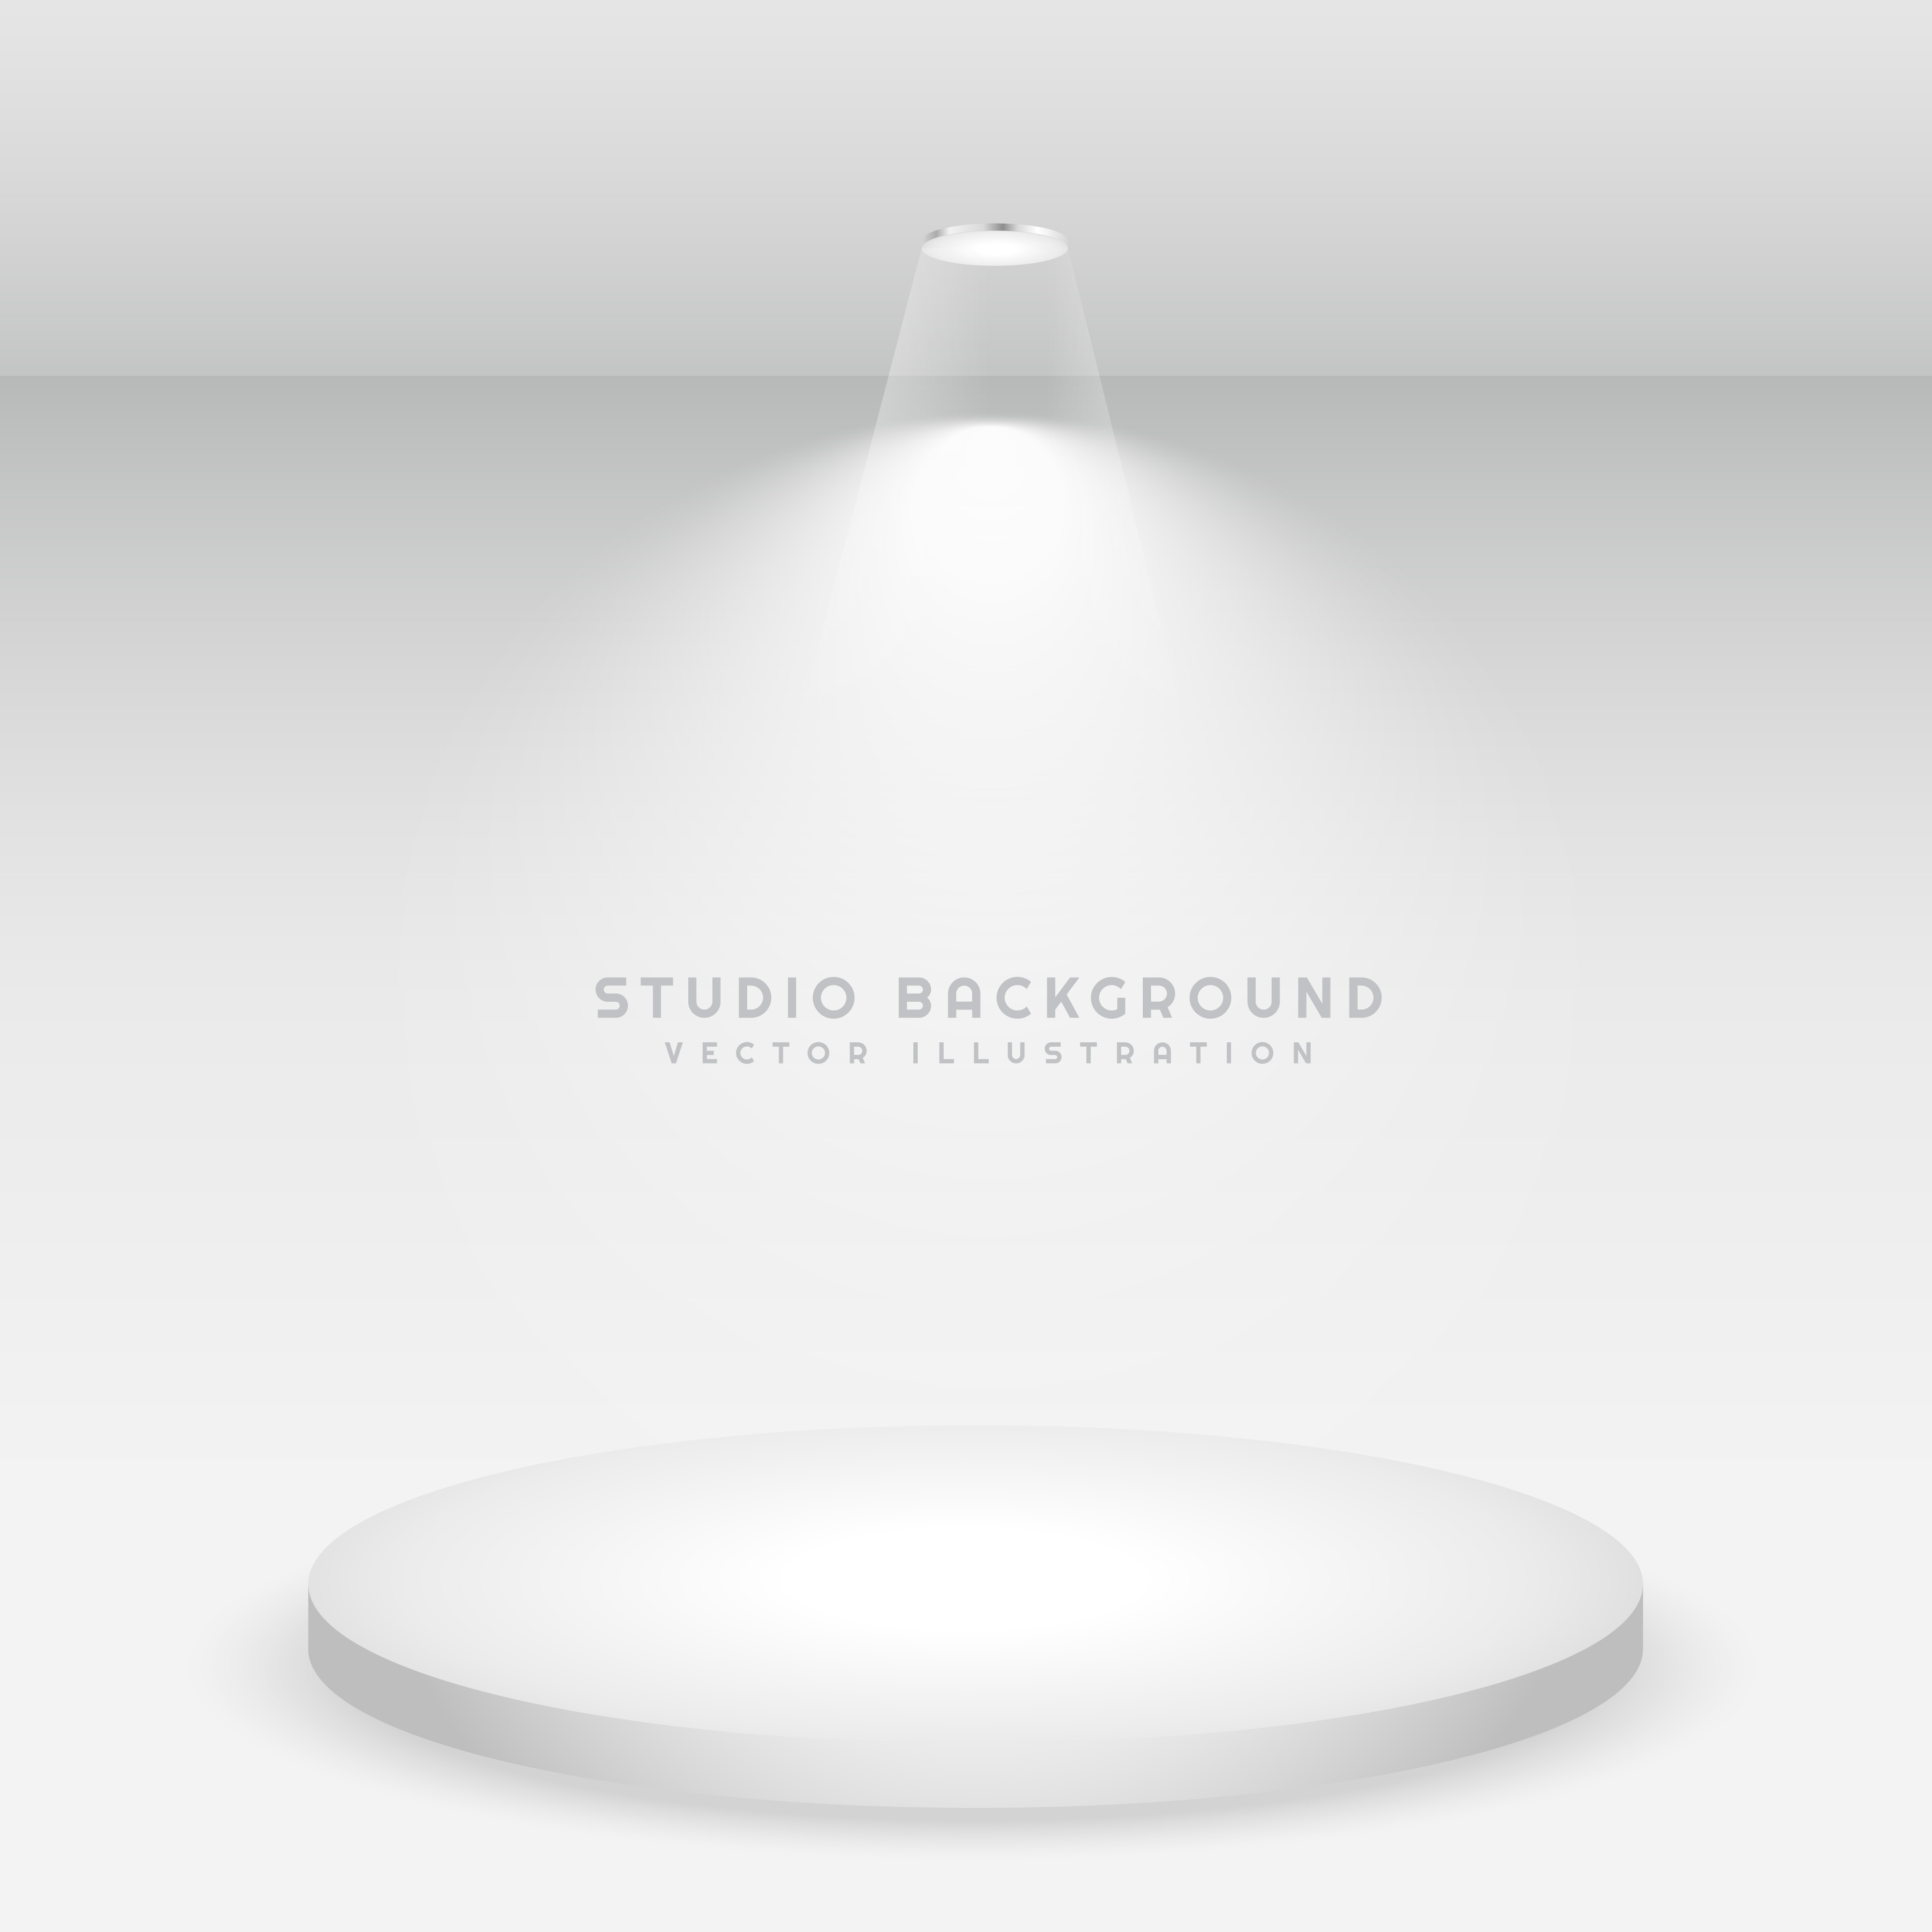 White Studio Background With Podium